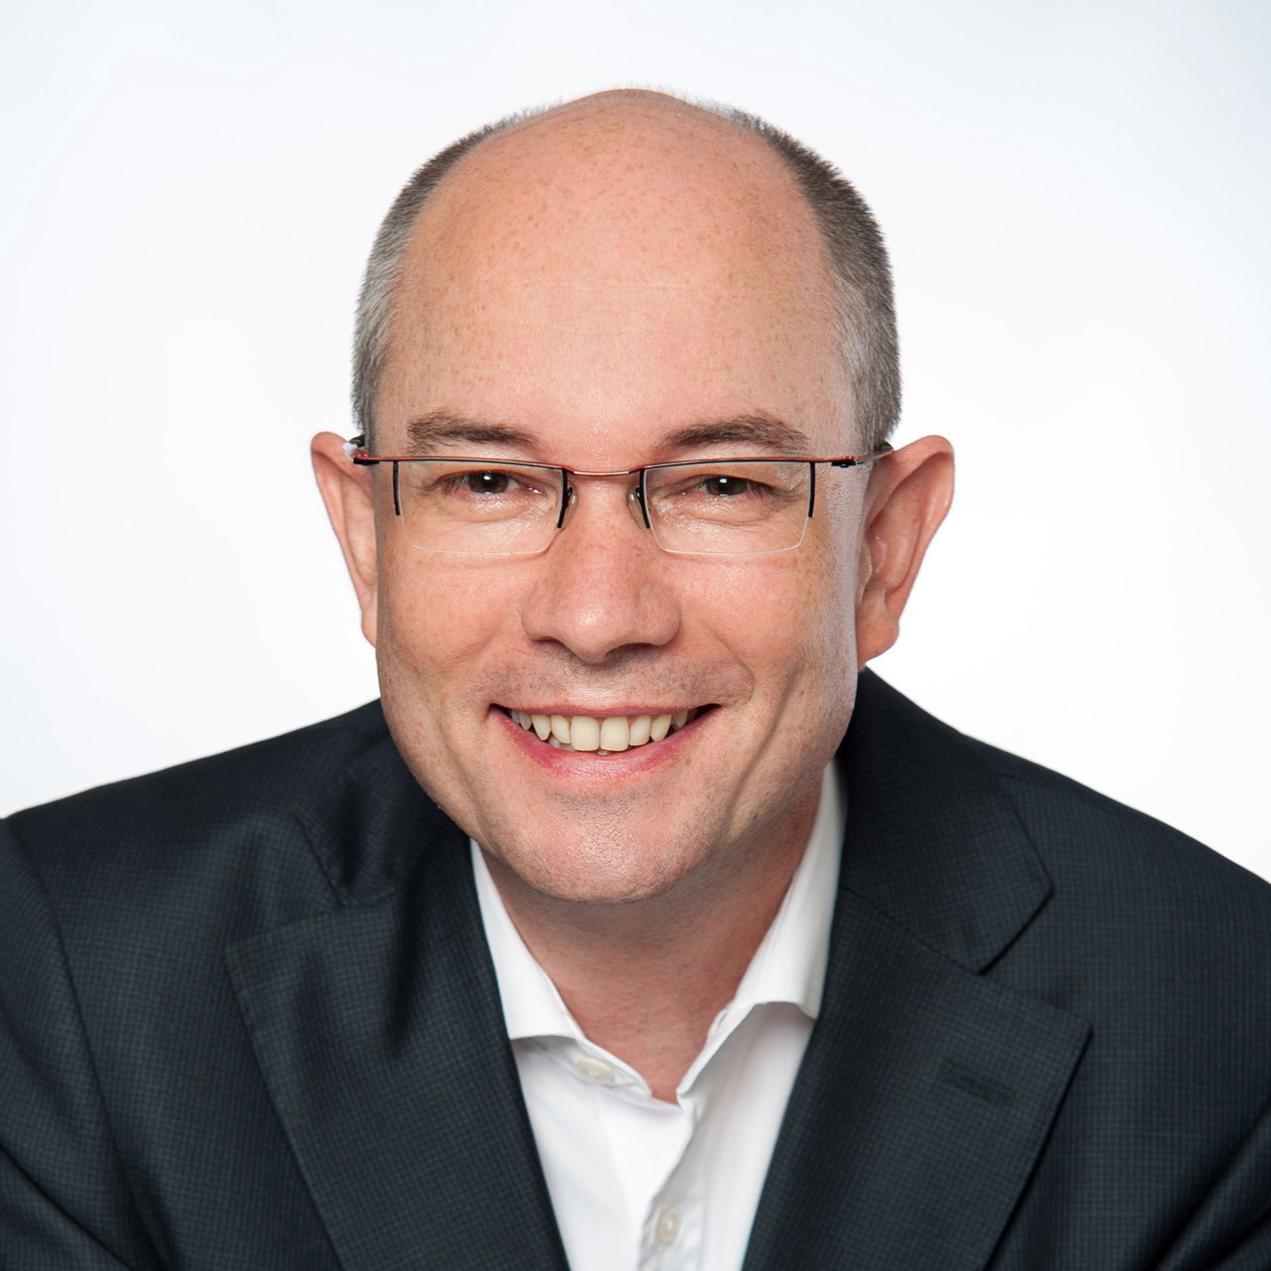 Ulrich Hank